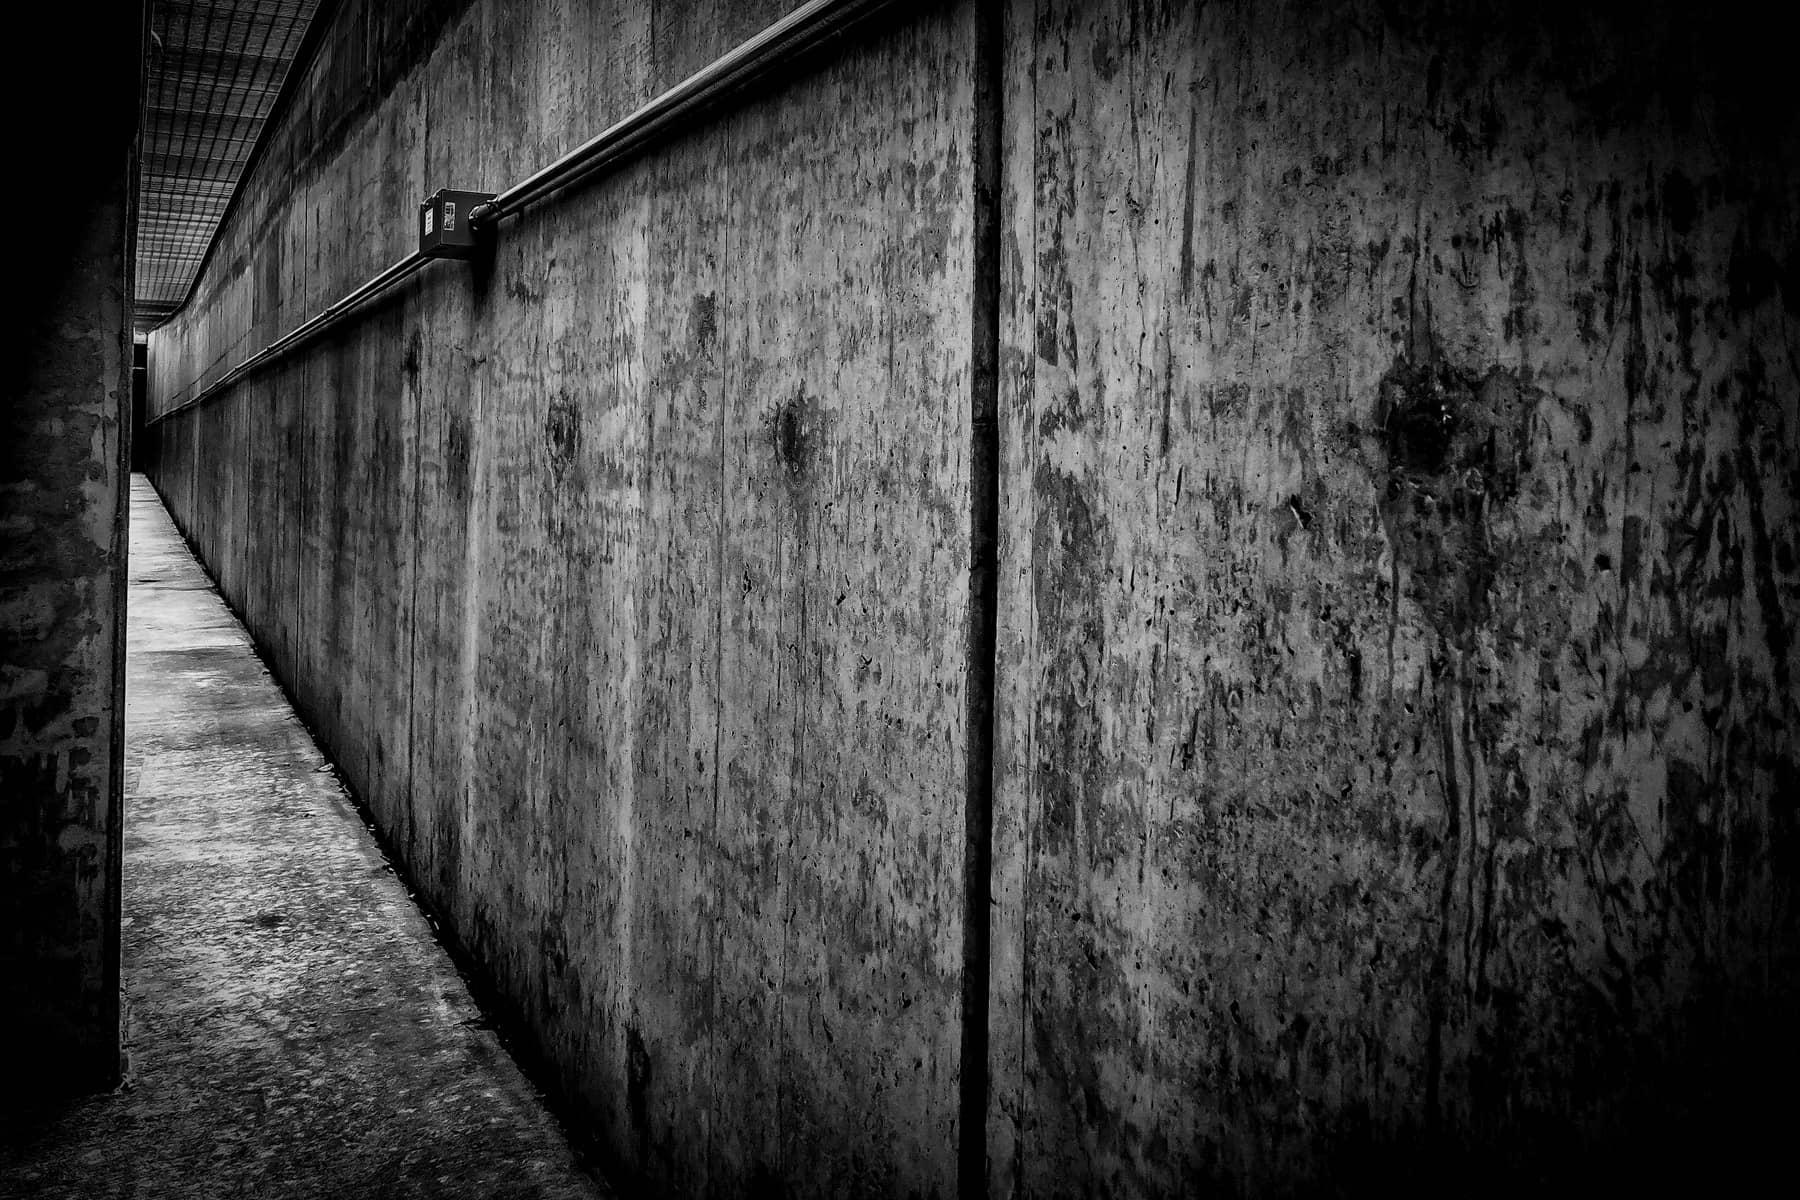 parking garage corridor